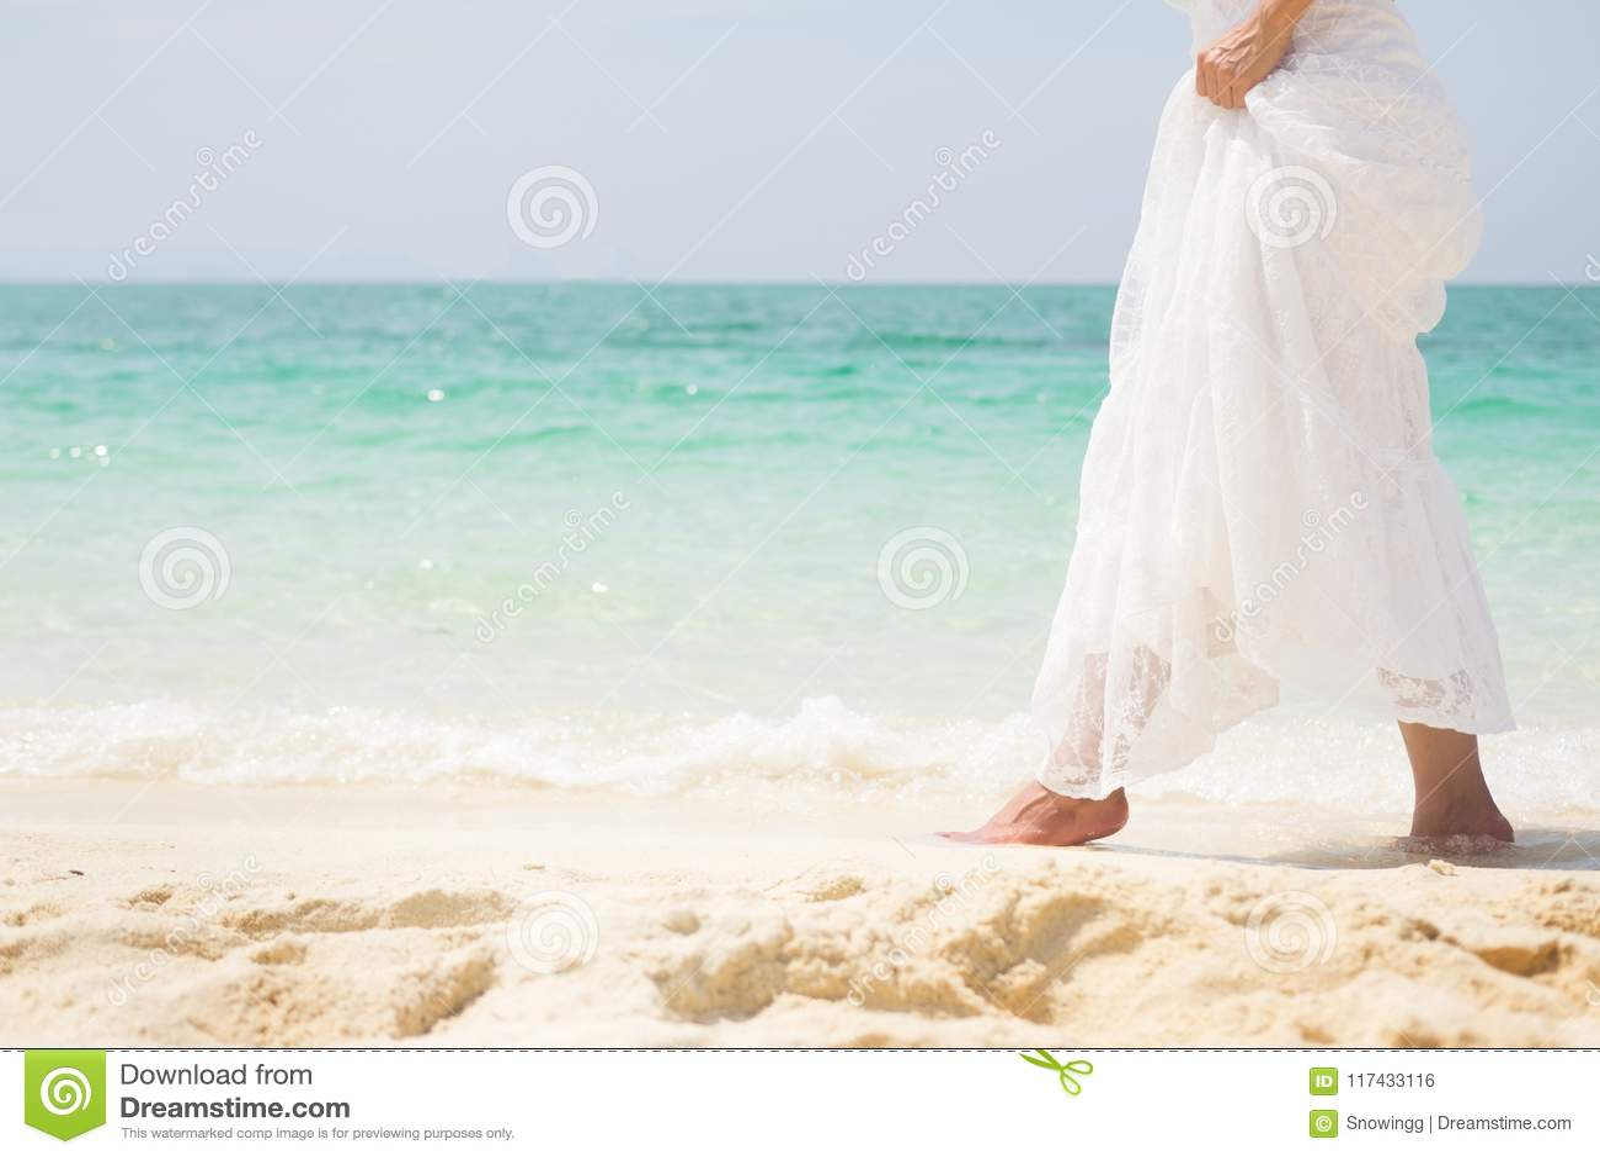 6a2739b275 A beautiful carefree Woman relaxing at the beach enjoying her sun dress  freedom wear